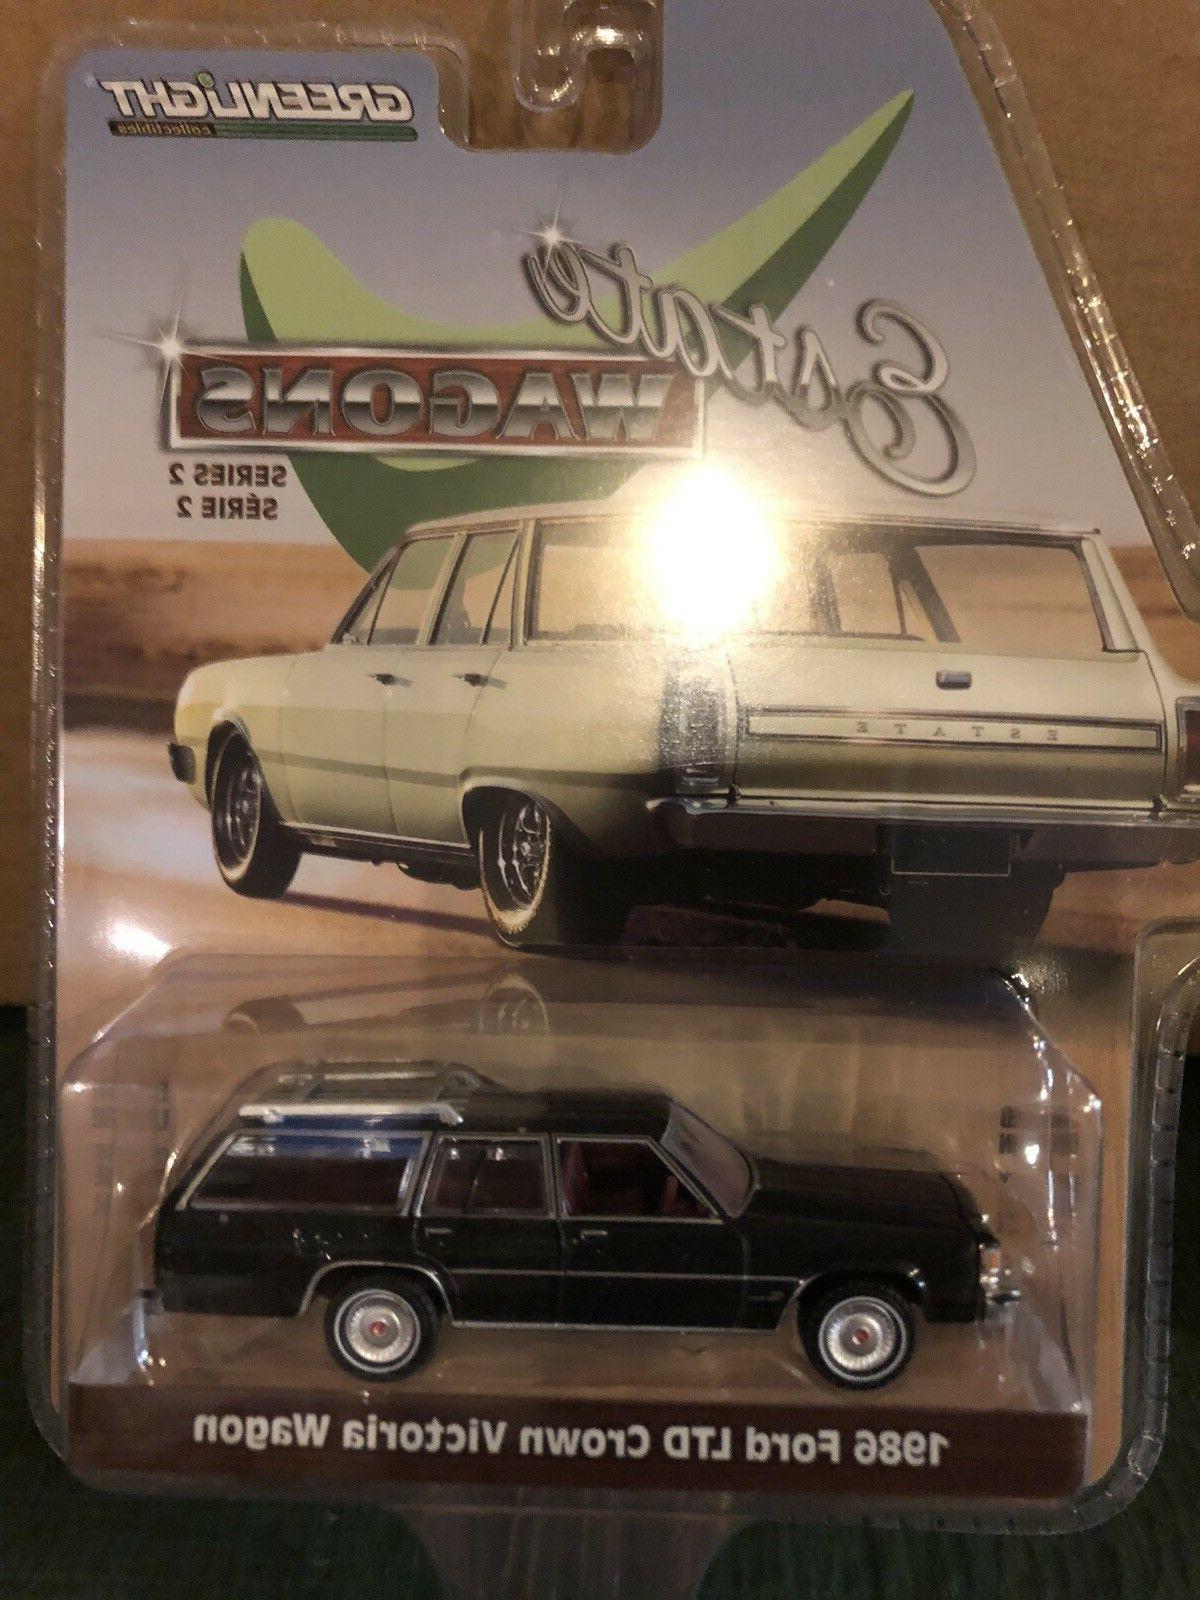 estate wagons 1986 ford ltd crown victoria